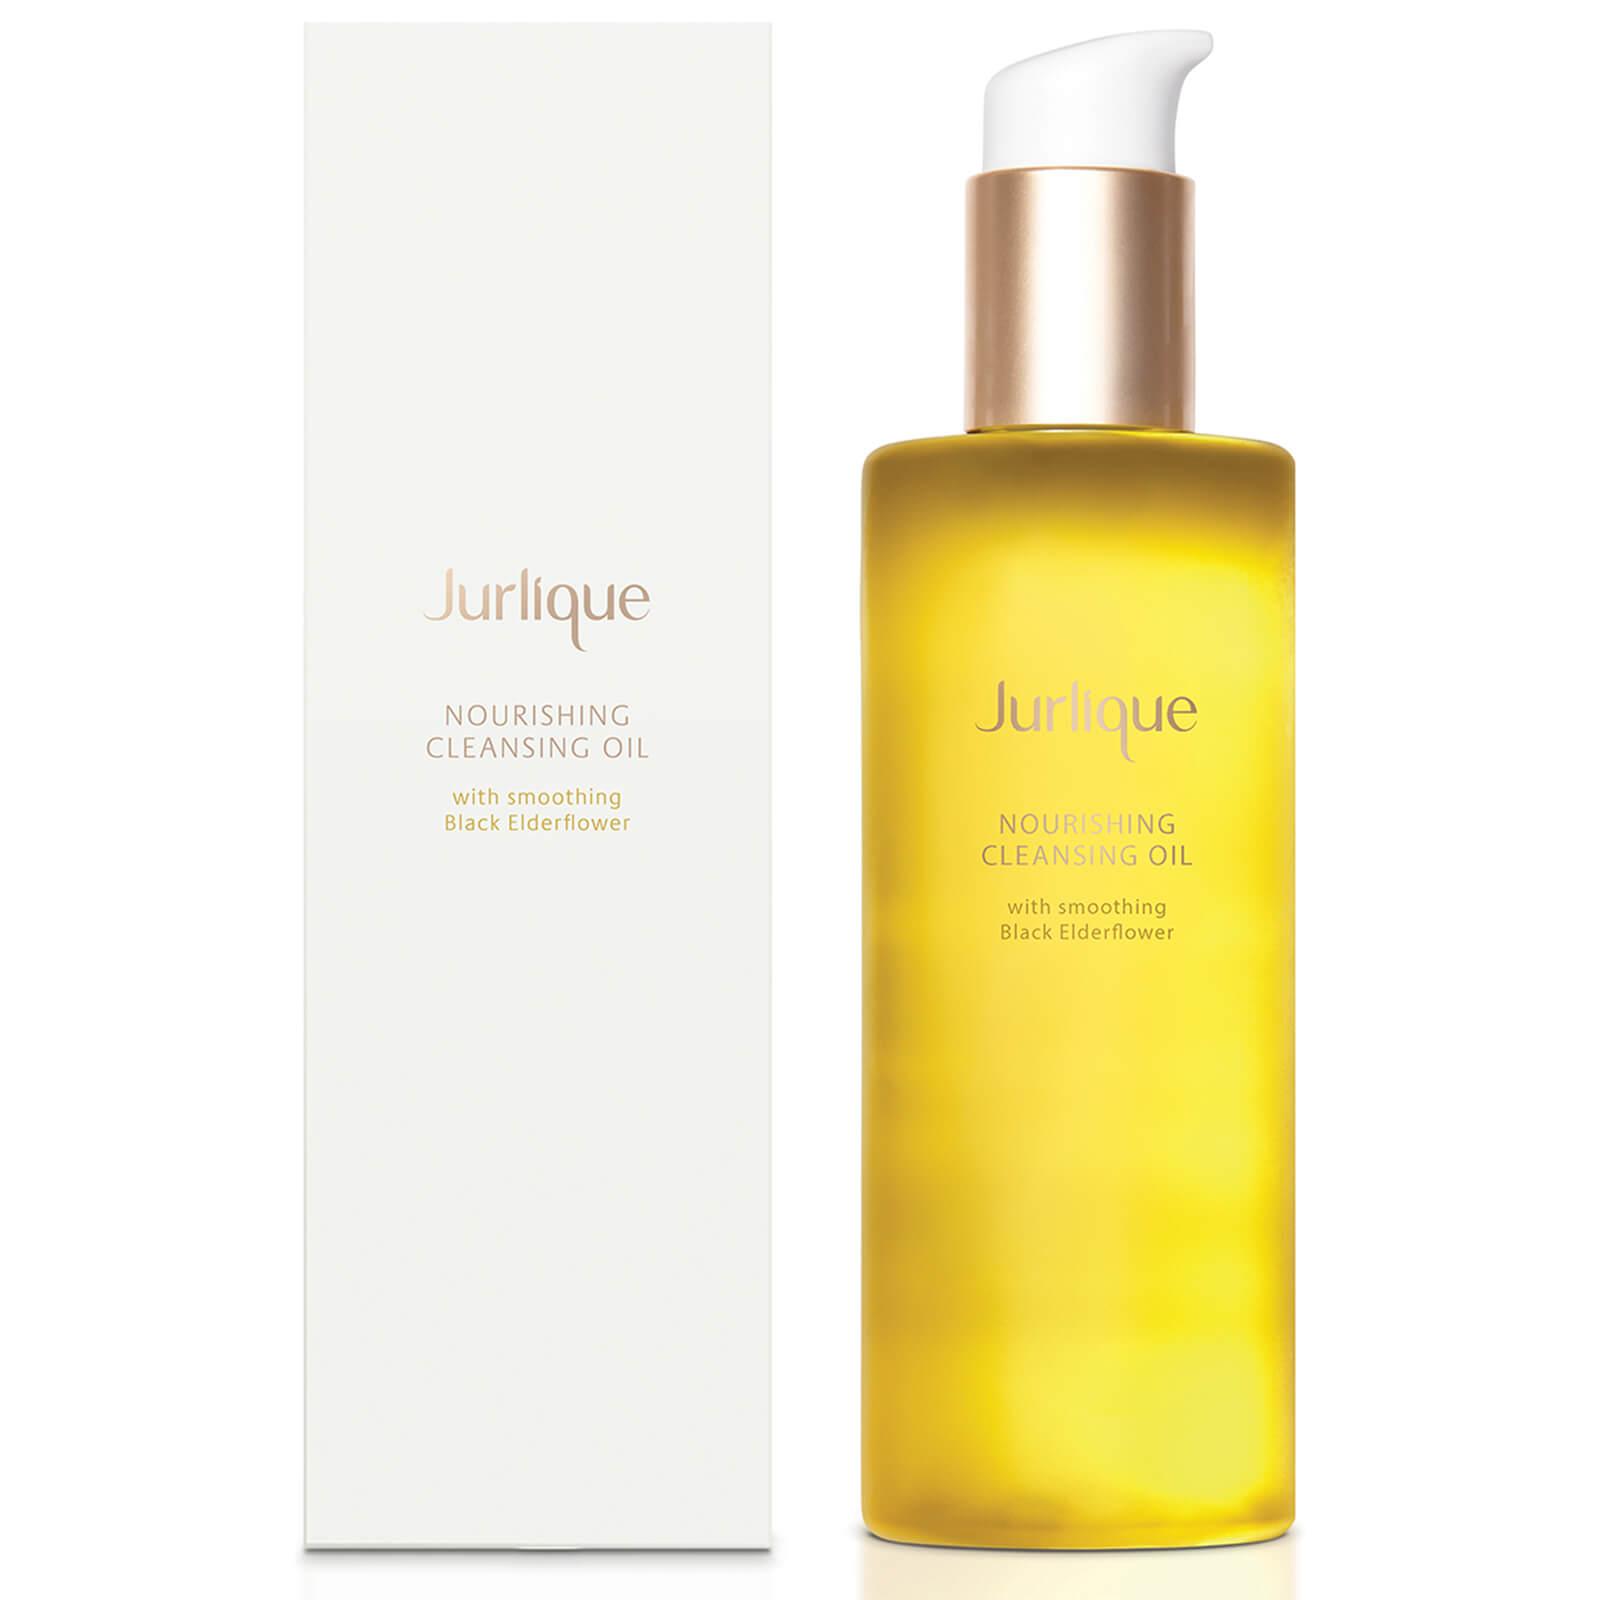 Jurlique Nourishing Cleansing Oil 200ml